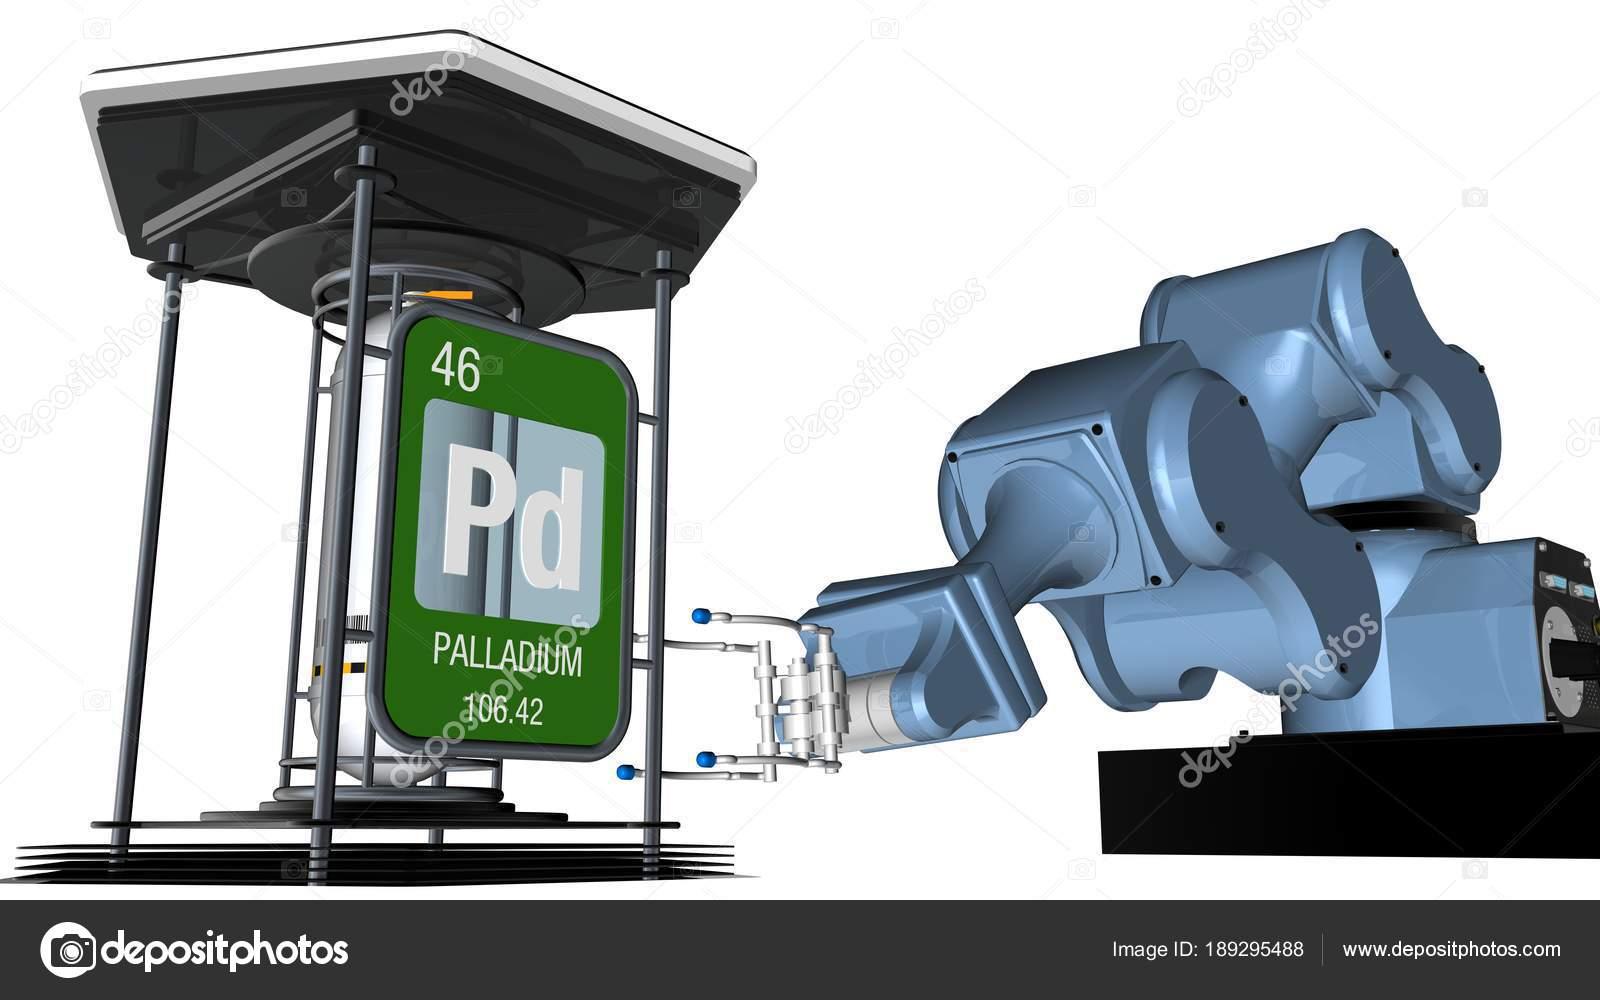 Palladium Symbol Square Shape Metallic Edge Front Mechanical Arm